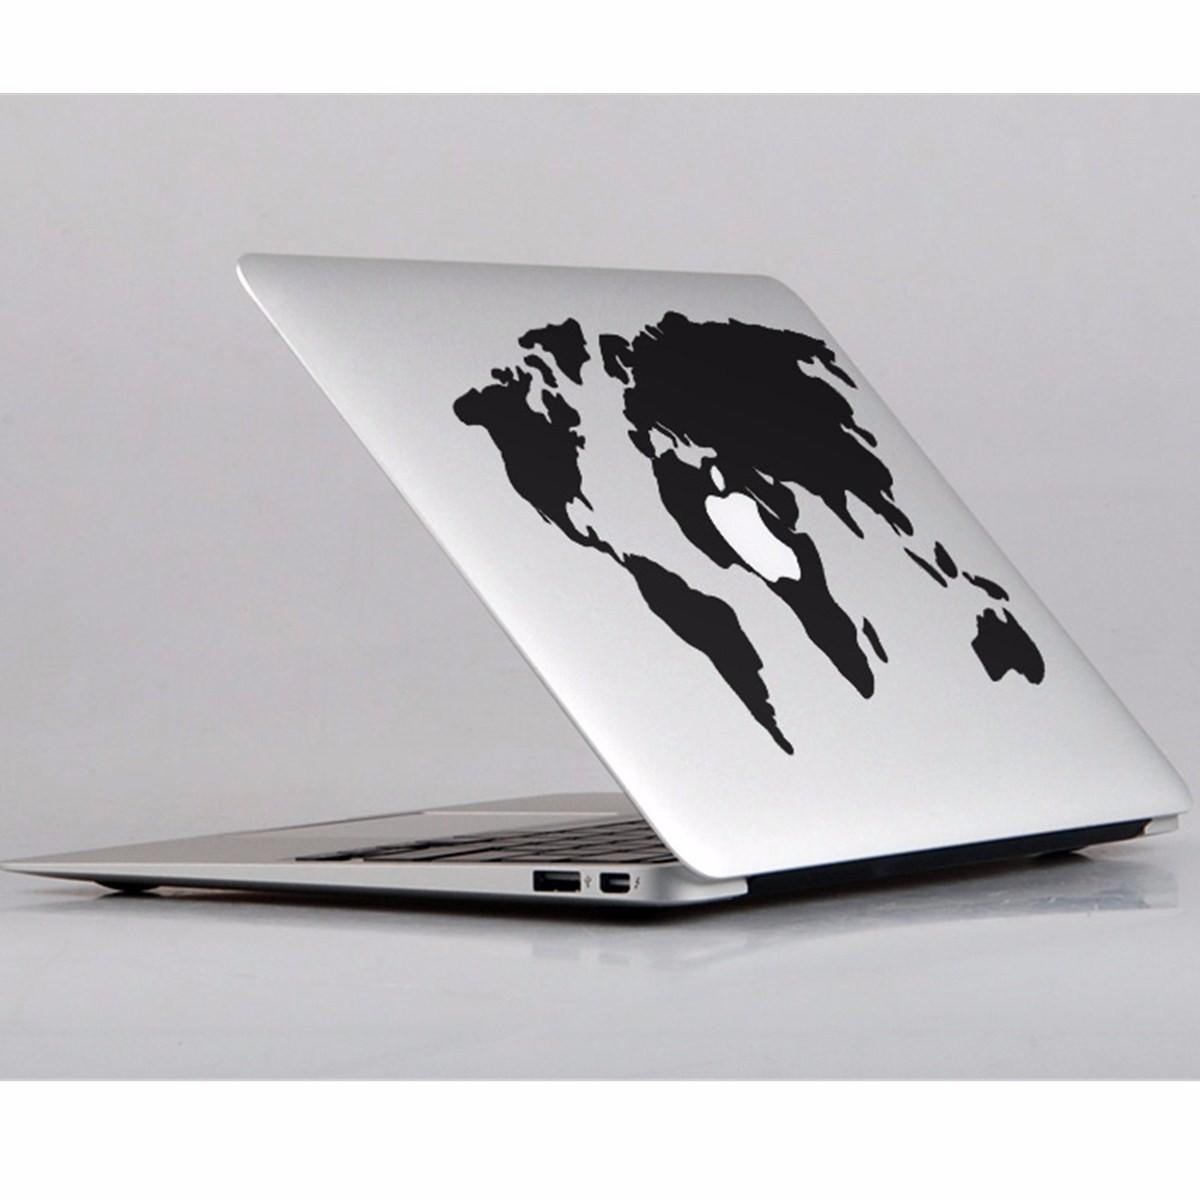 Macbook skin sticker eBay